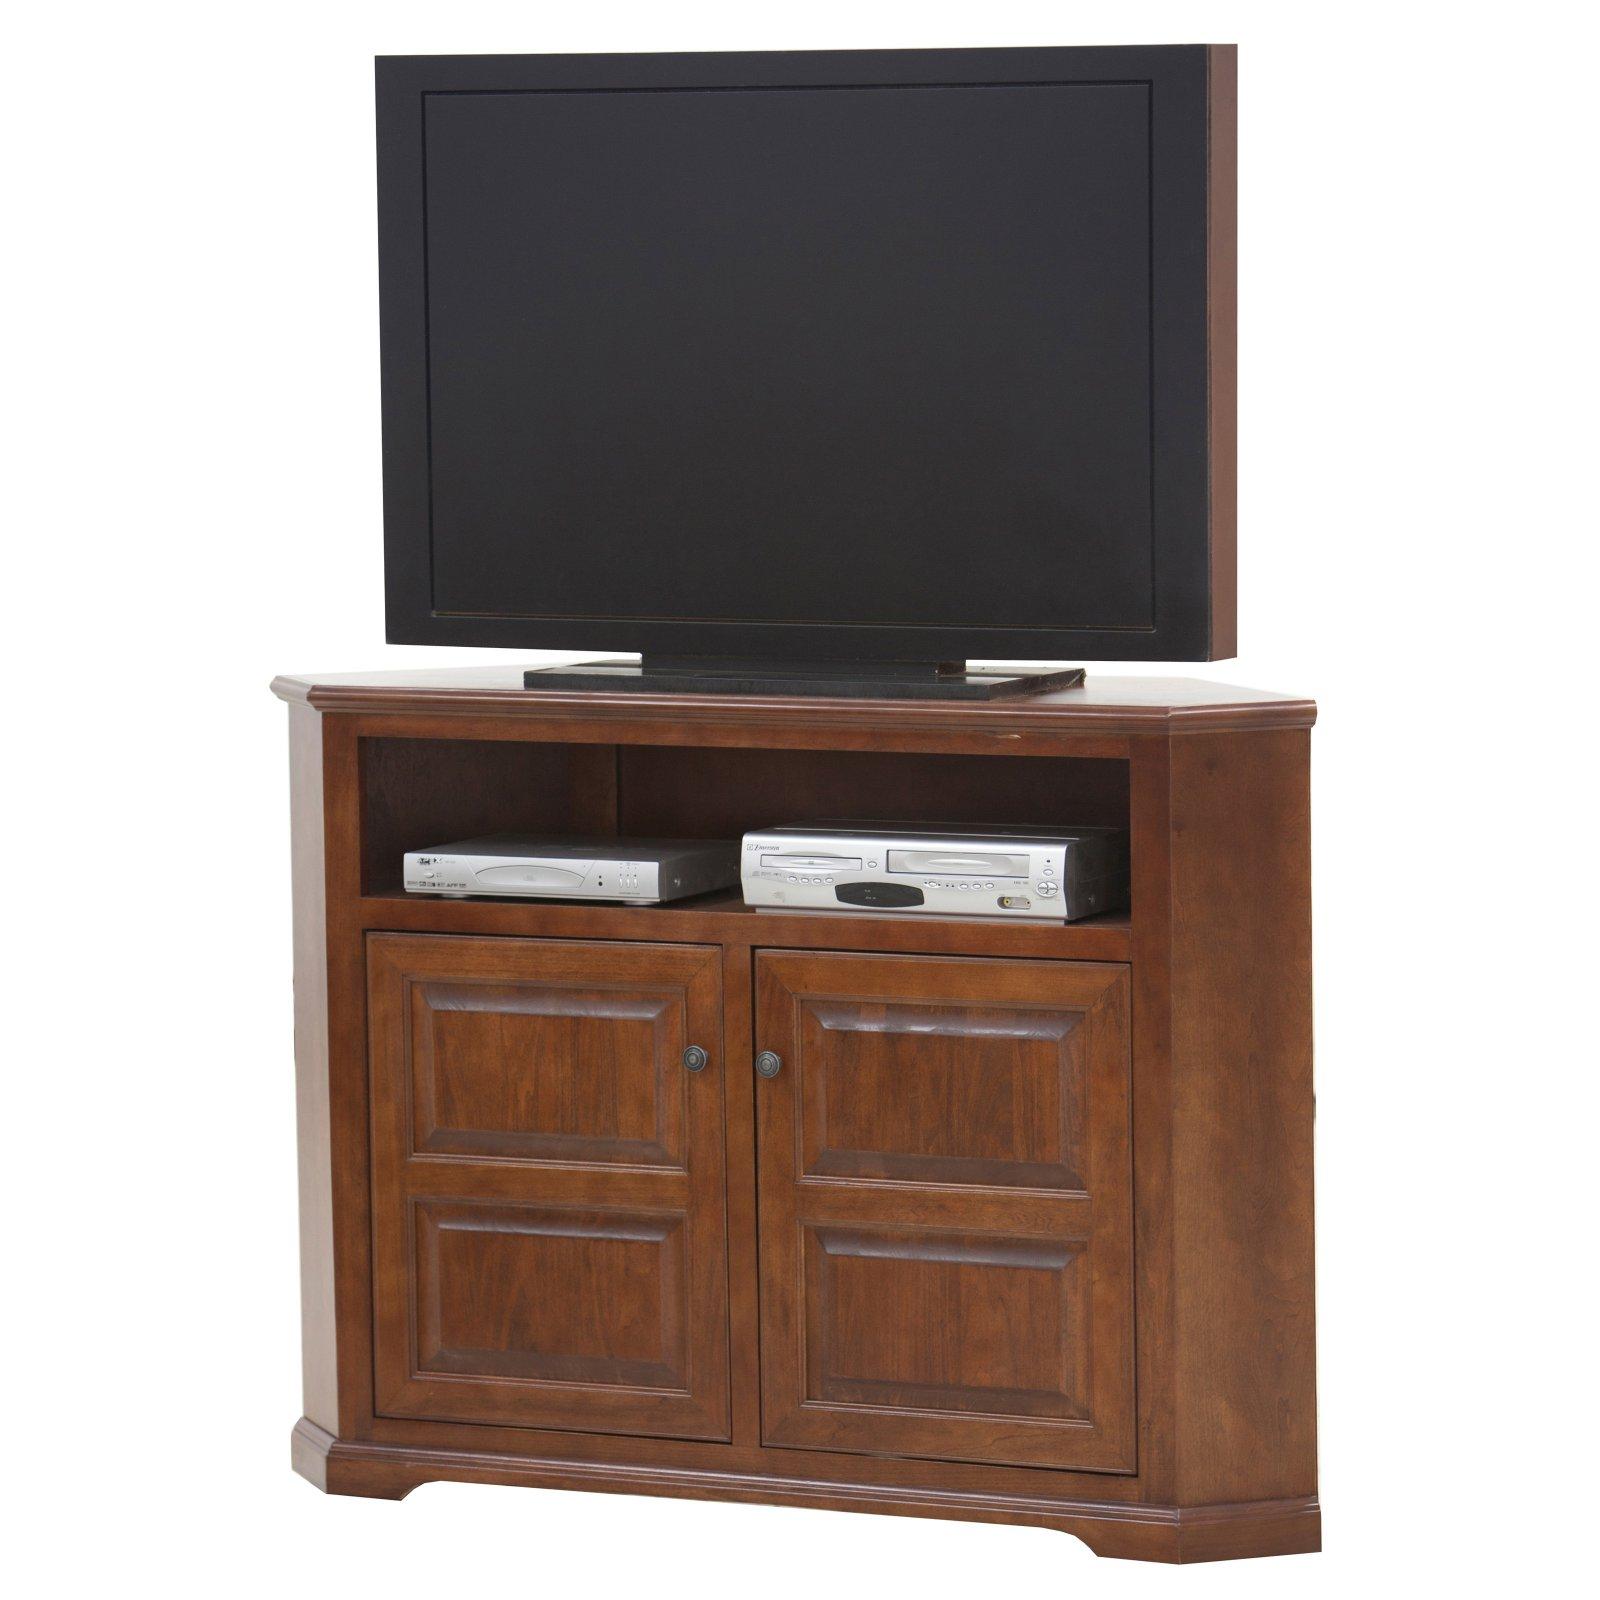 Eagle Furniture Savannah 56 in. Wide Corner TV Stand